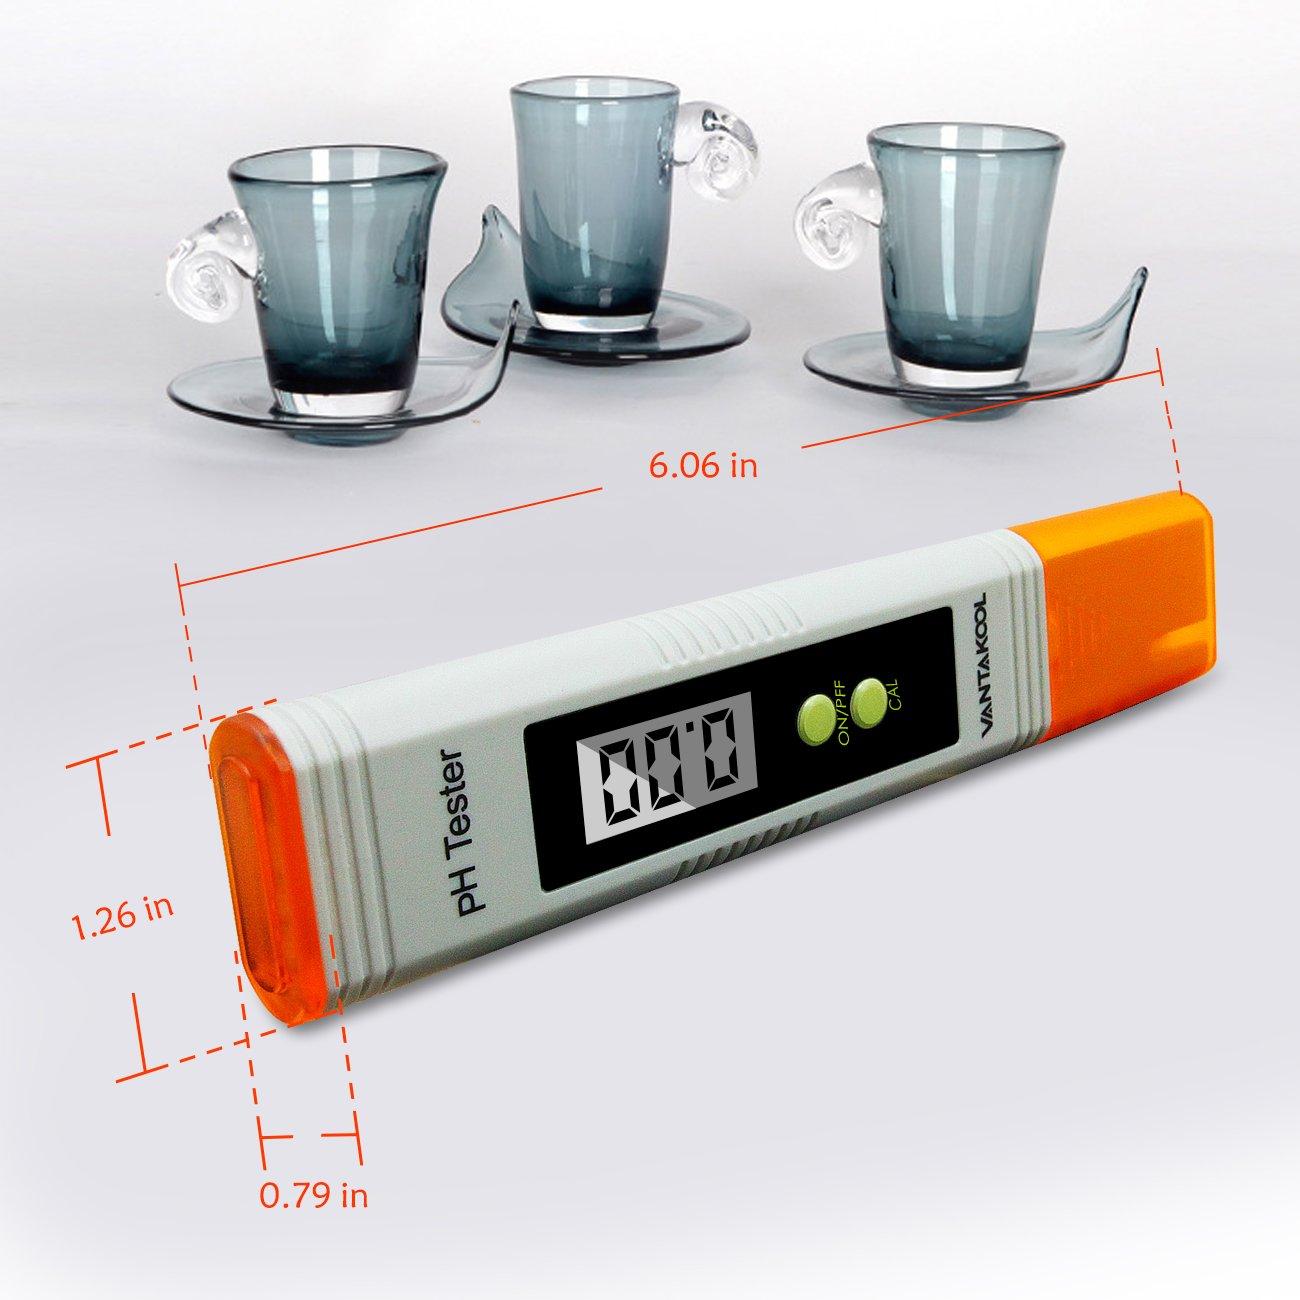 VANTAKOOL Digital PH Meter, 0.01 PH High Accuracy Pocket Size PH Meter/PH Tester with 0-14.0 Measuring Range, Water Quality Tester for Household Drinking Water, Swimming Pools, Aquariums (Orange) by VantaKool (Image #6)